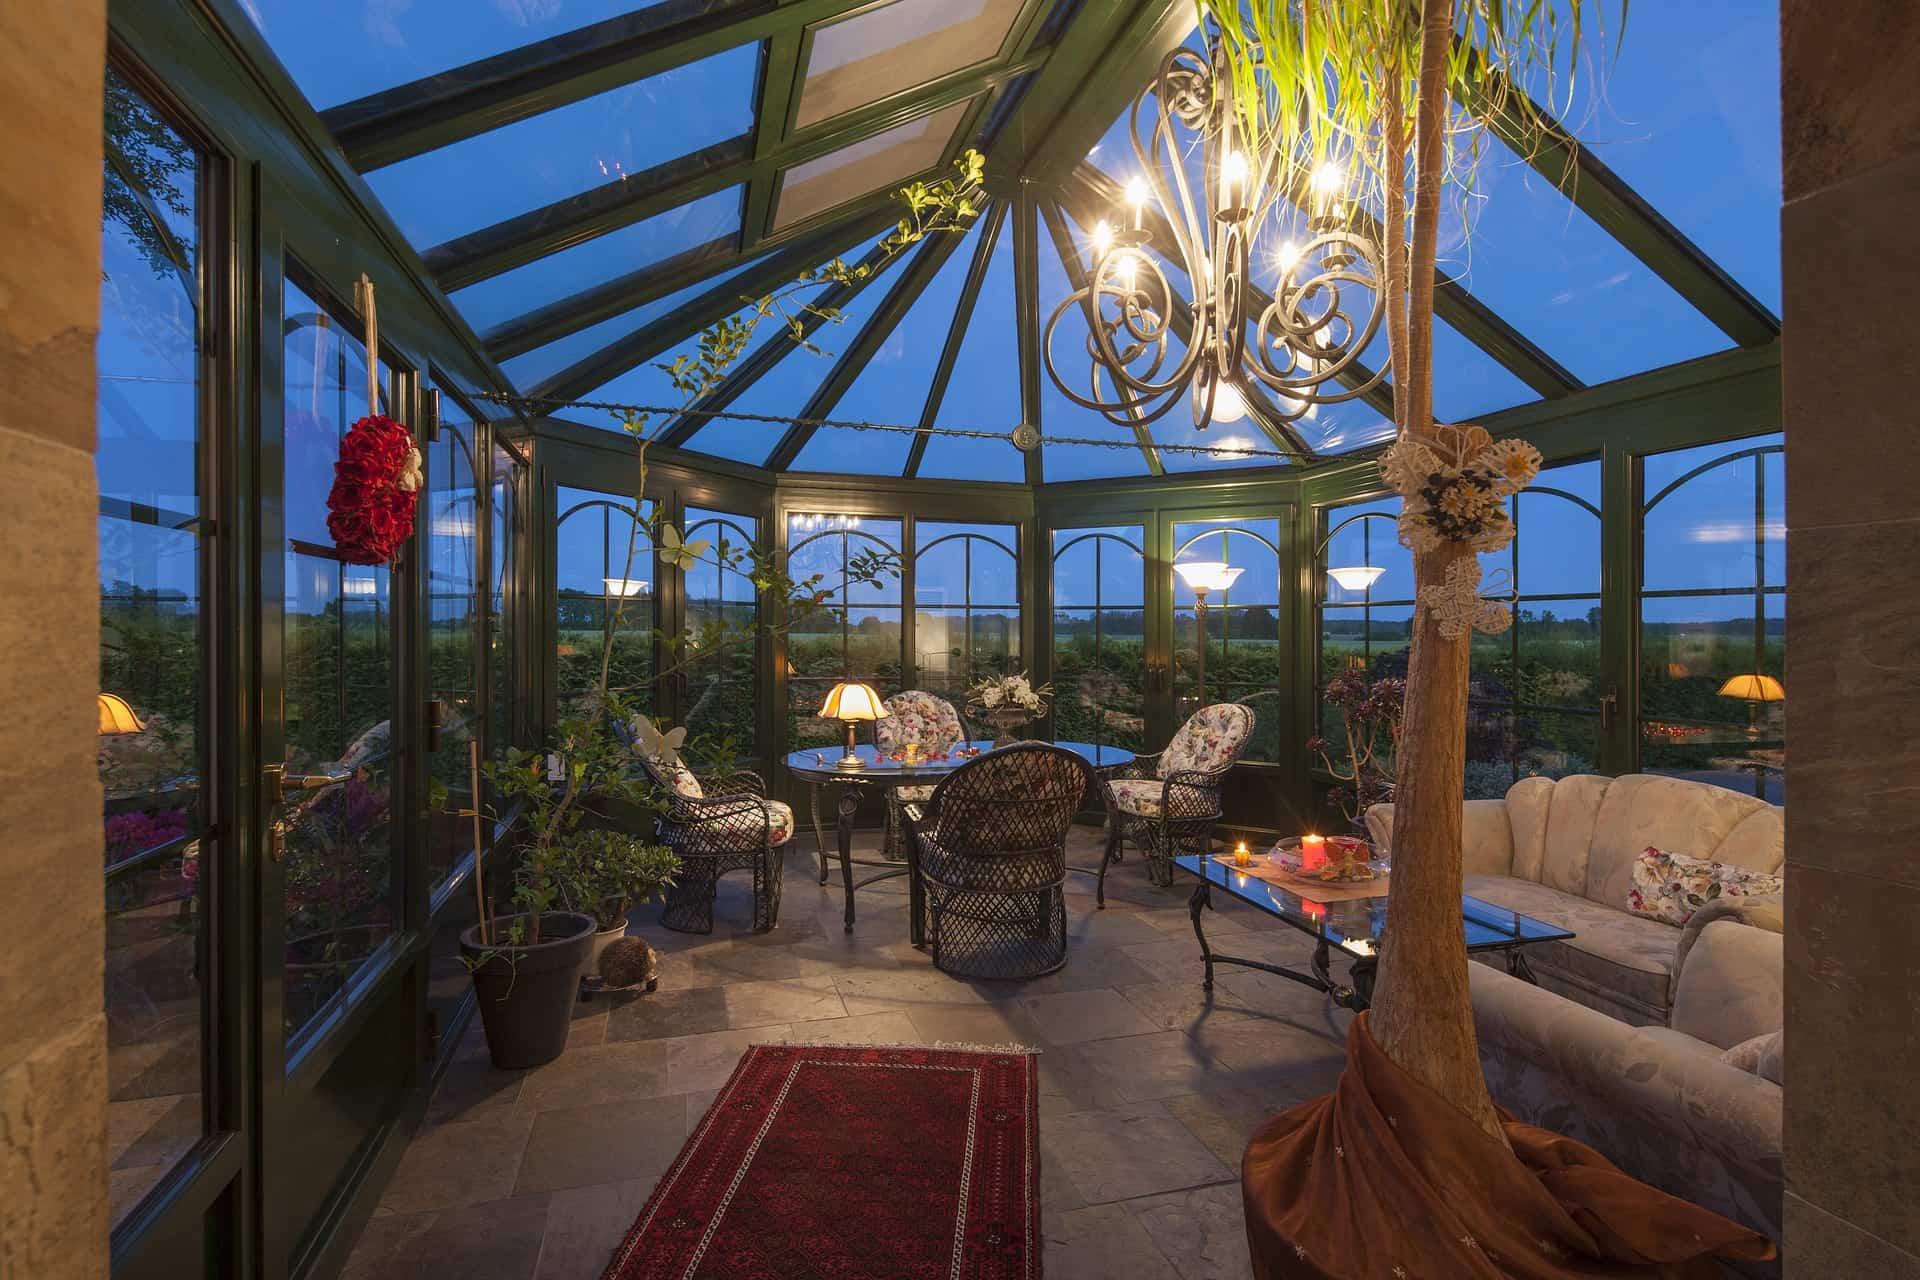 como usar el balcon o terraza en invierno